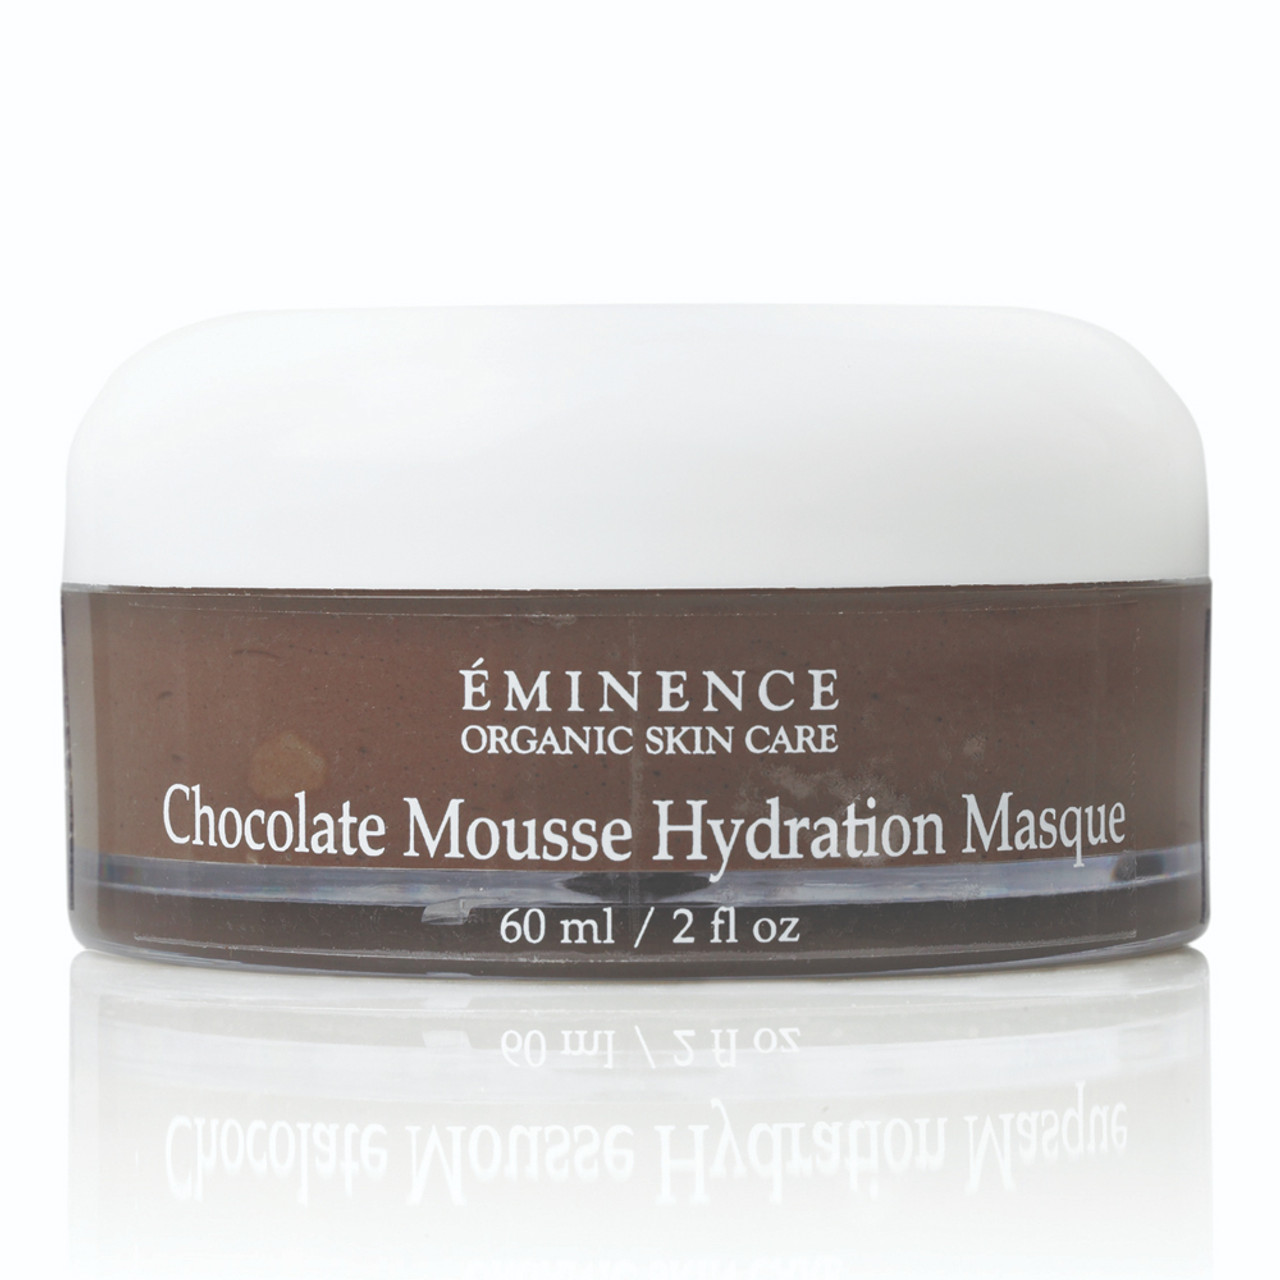 Eminence Chocolate Mousse Hydration Masque BeautifiedYou.com